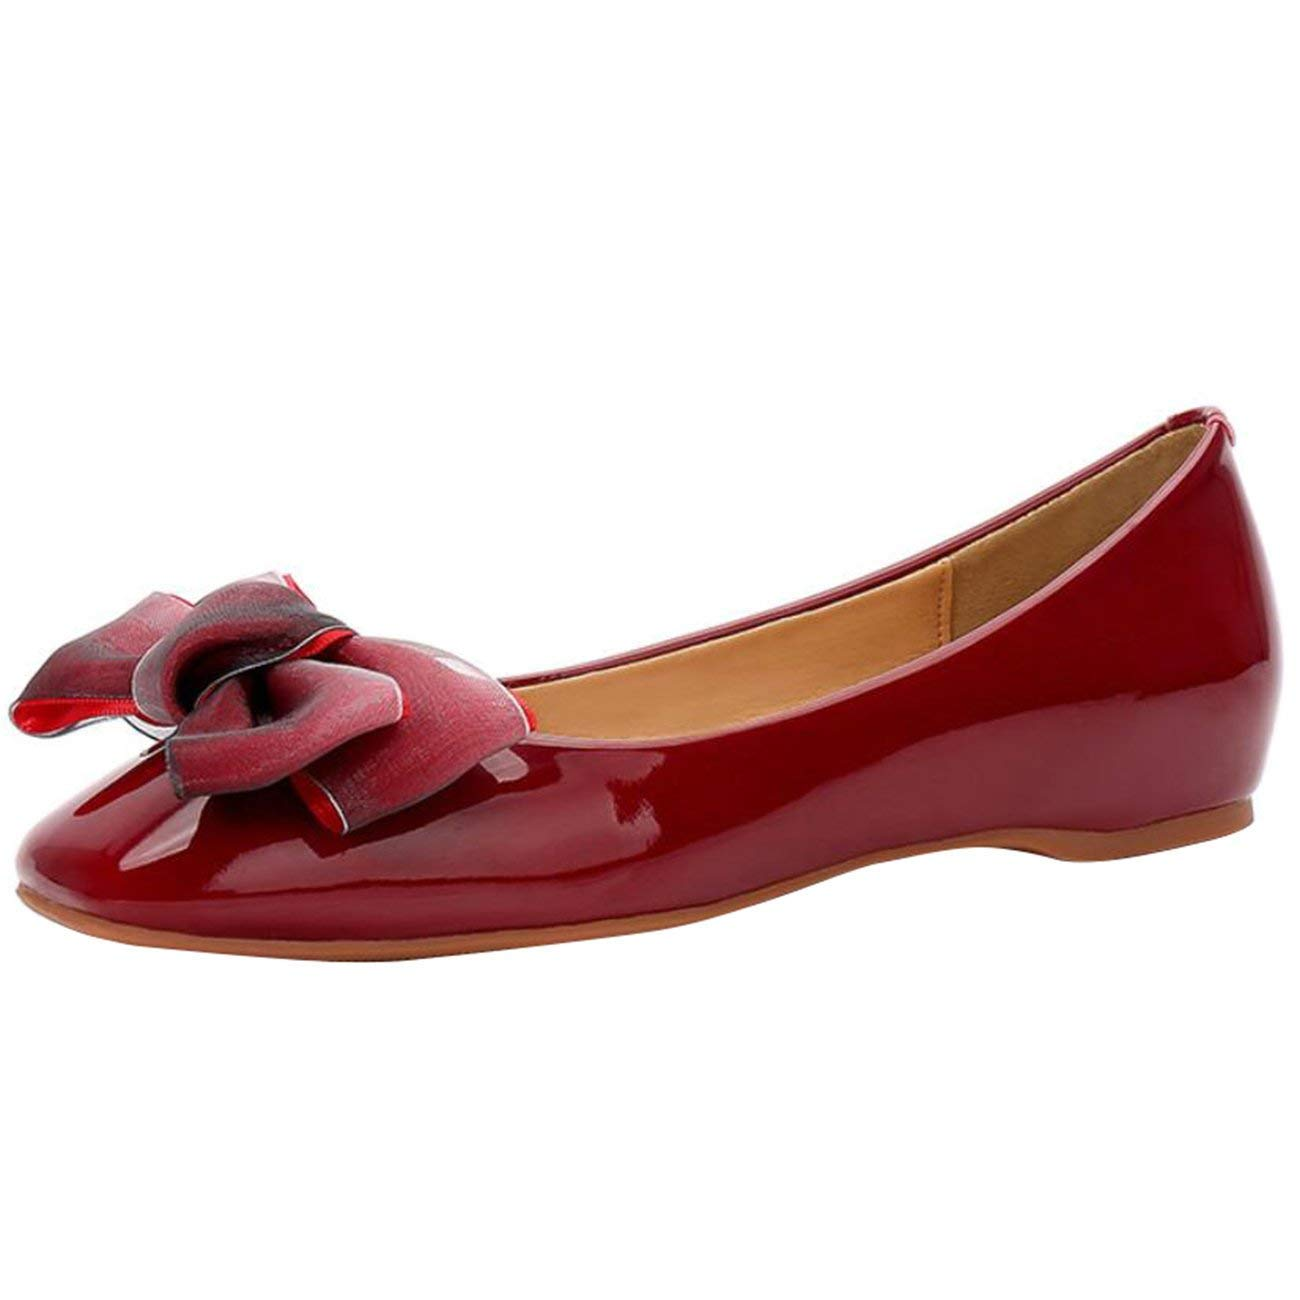 Fuxitoggo Frauen Square-Toe Flache Slip-On Slip-On Slip-On Bowknot Ballerinas (Farbe   Burgundy Größe   2 UK) 430cd7